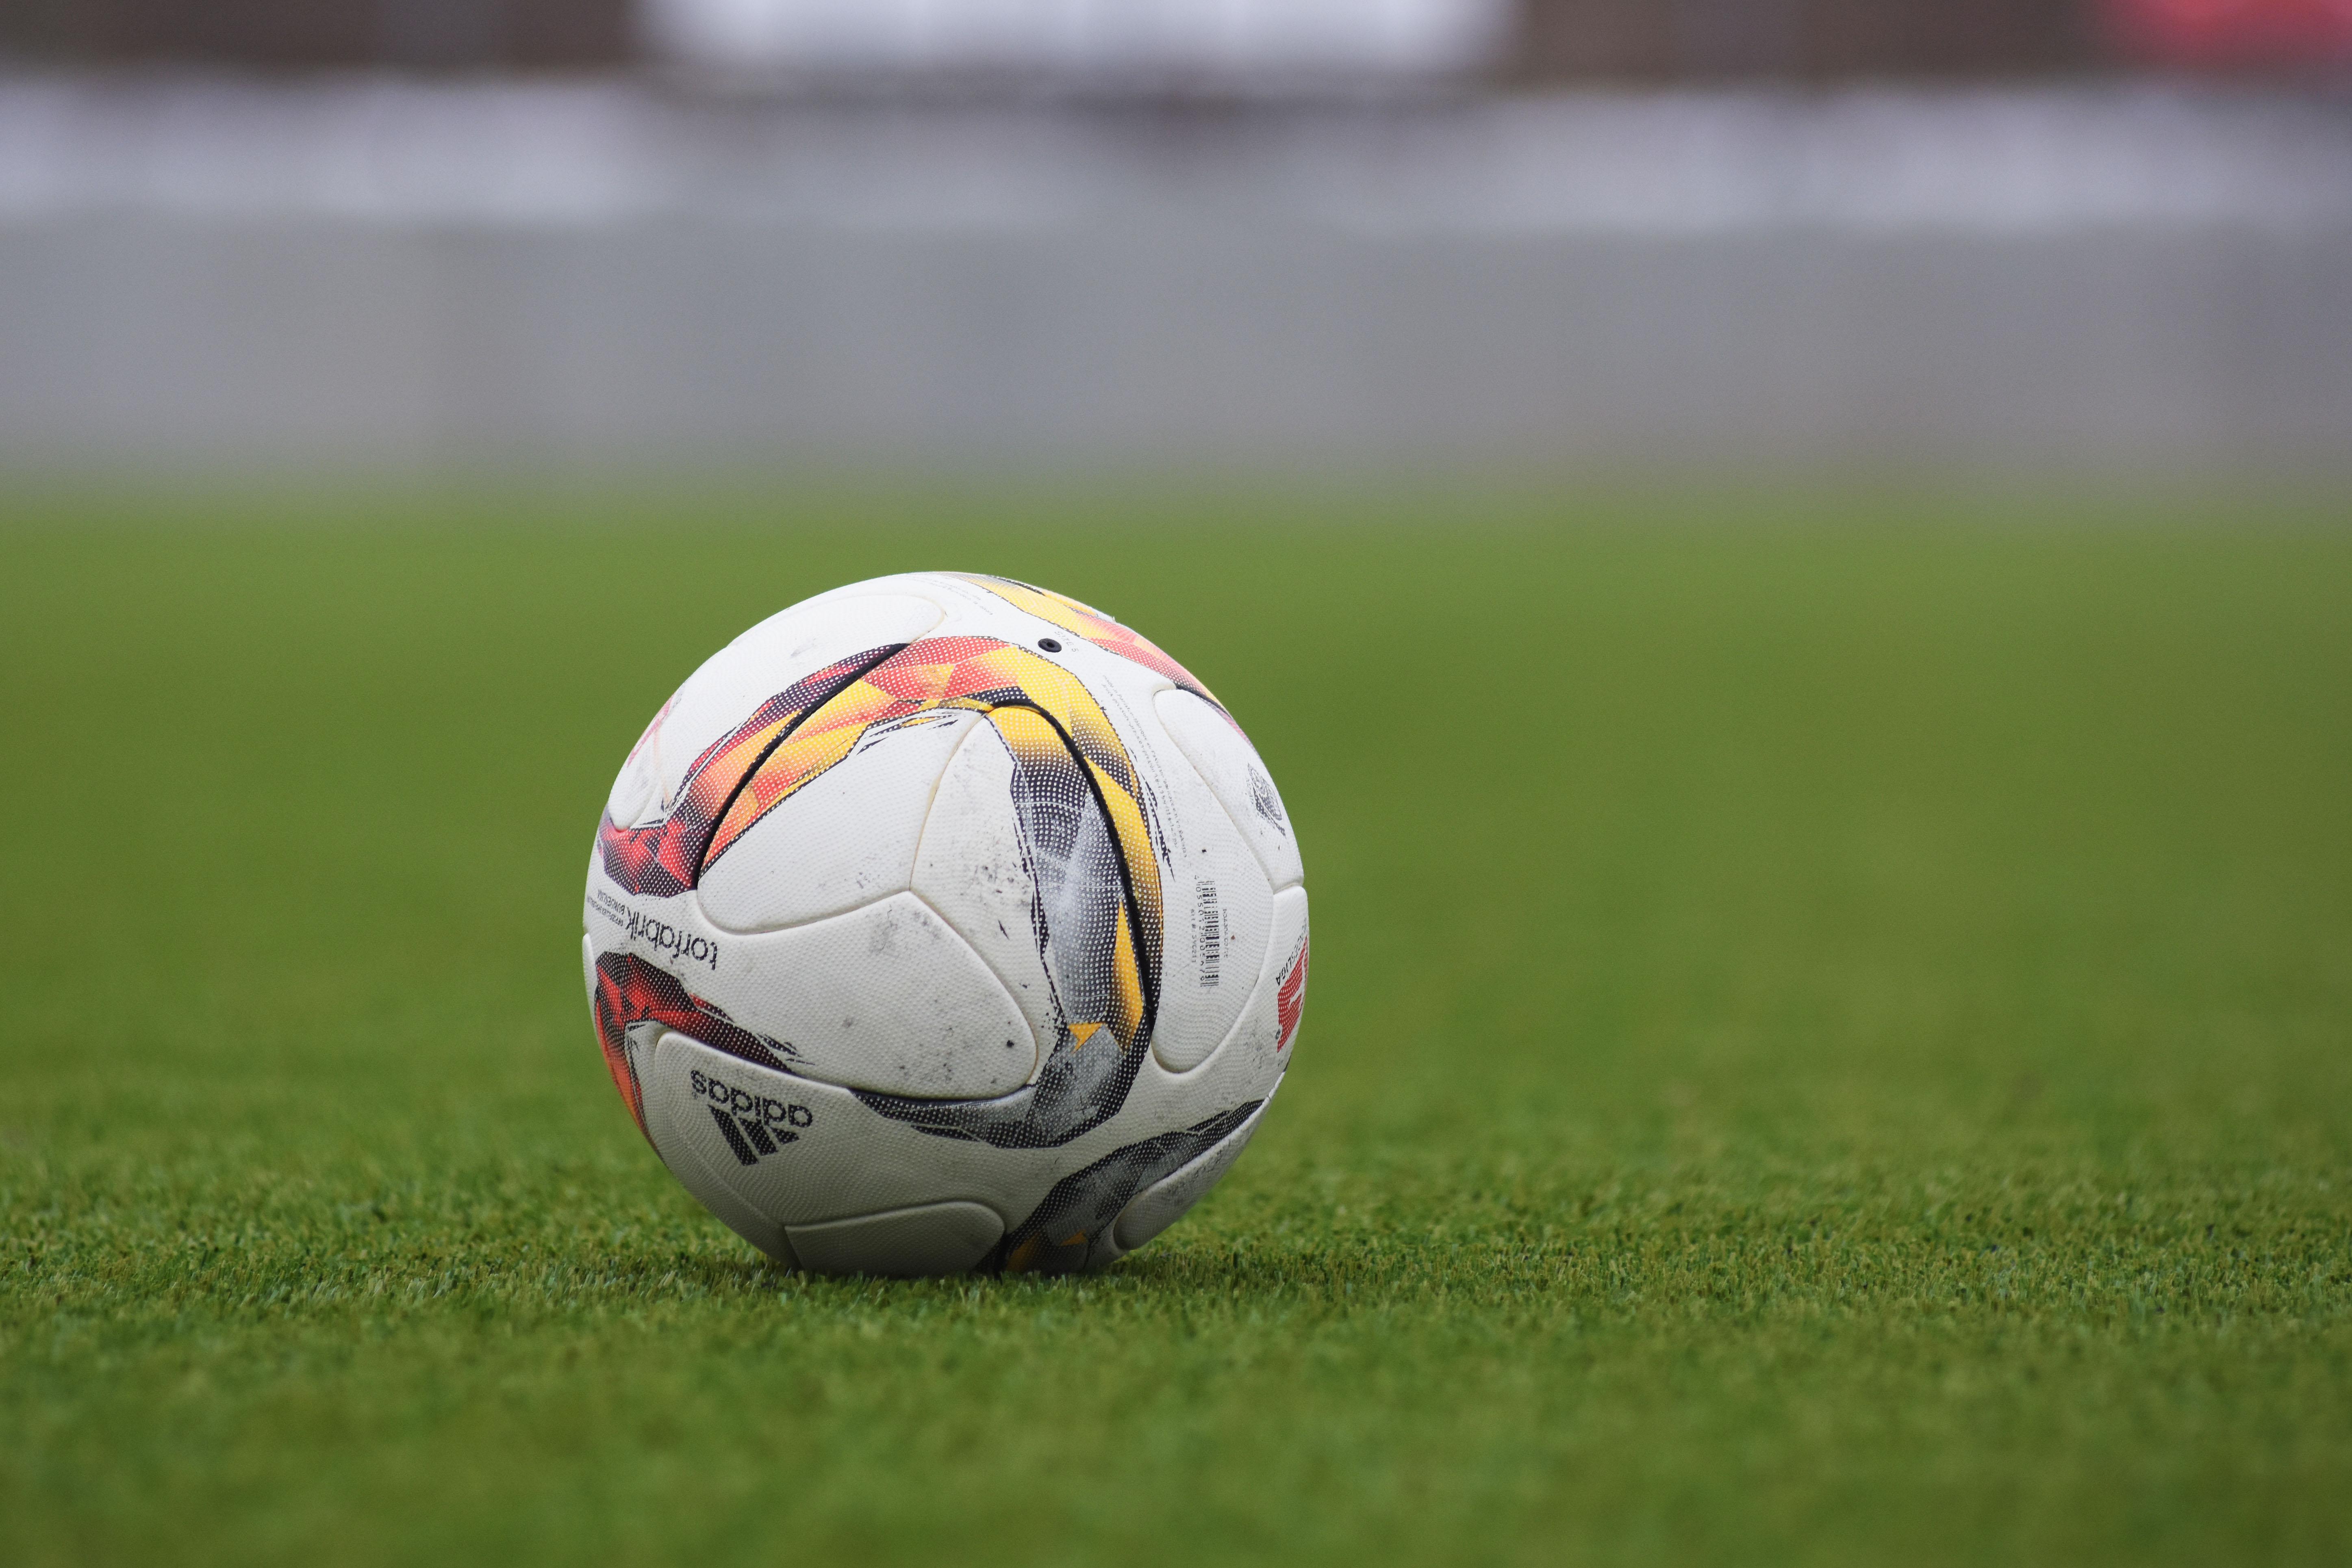 b56a084b2 Bildet : gress, Fotball, stadion, spiller, sportsutstyr, sport, ball ...